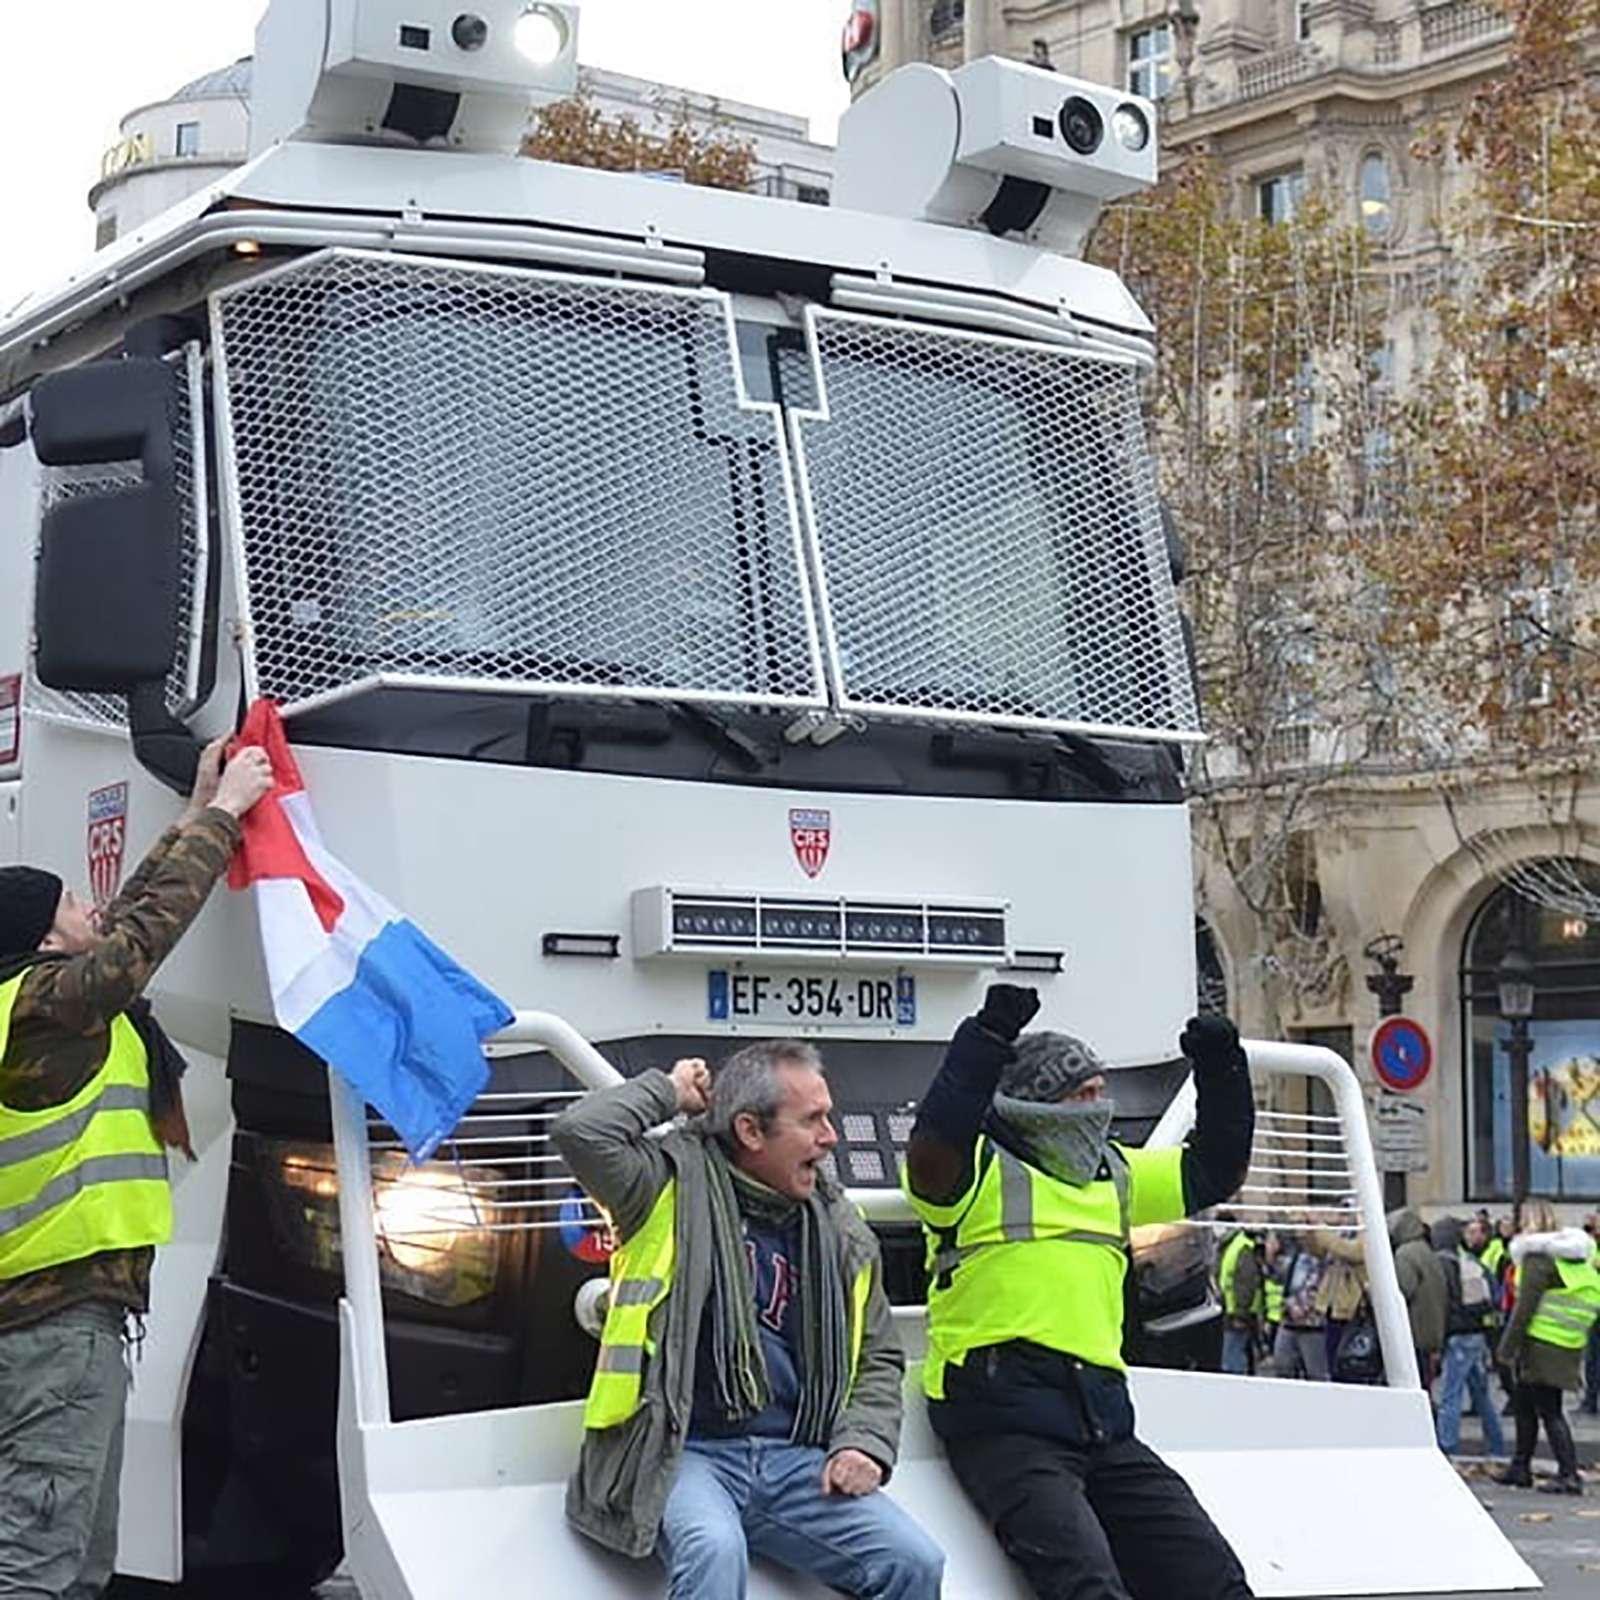 Какфранцузы протестуют против роста цен натопливо: баррикады против водометов— фото 926162